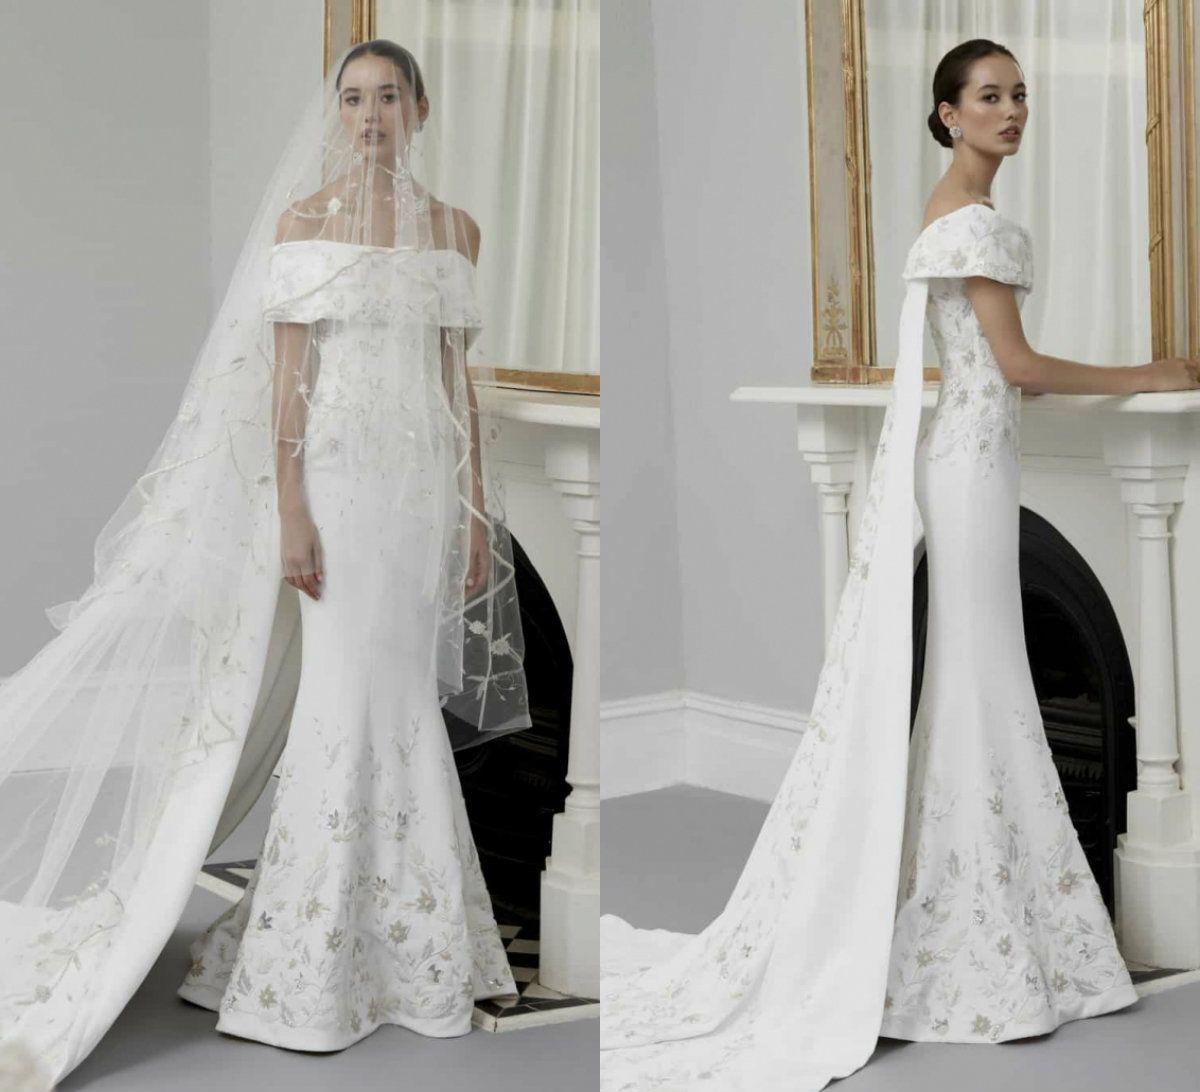 f43958f25811 2019 Mermaid Wedding Dresses Steven Khalil Off The Shoulder Lace Appliques  Sweep Train Country Bridal Gowns Satin Beach Wedding Dress Informal Wedding  ...